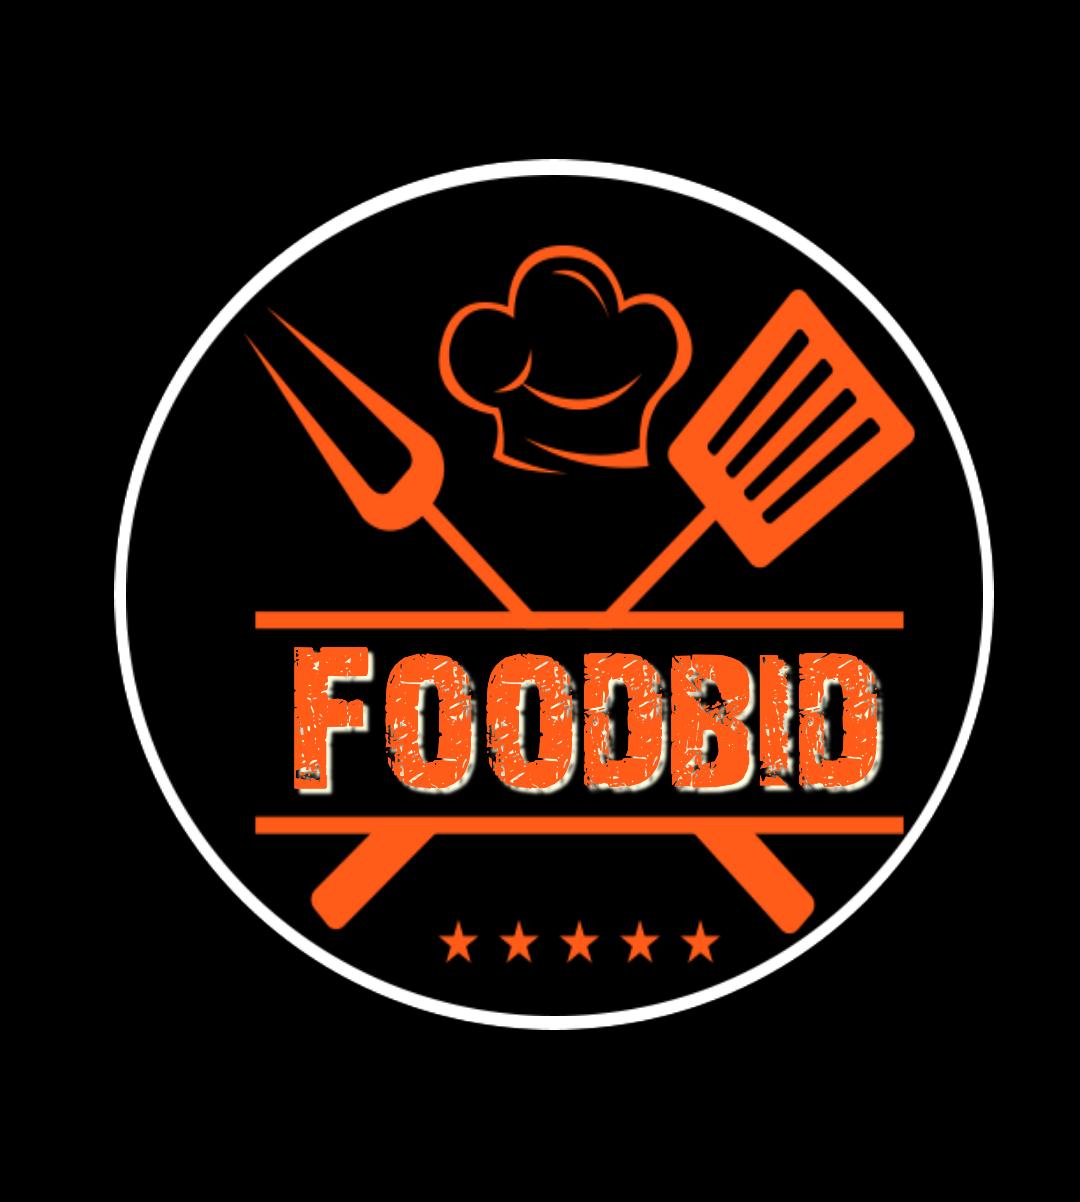 logo-foodbid-29-1585760328.png